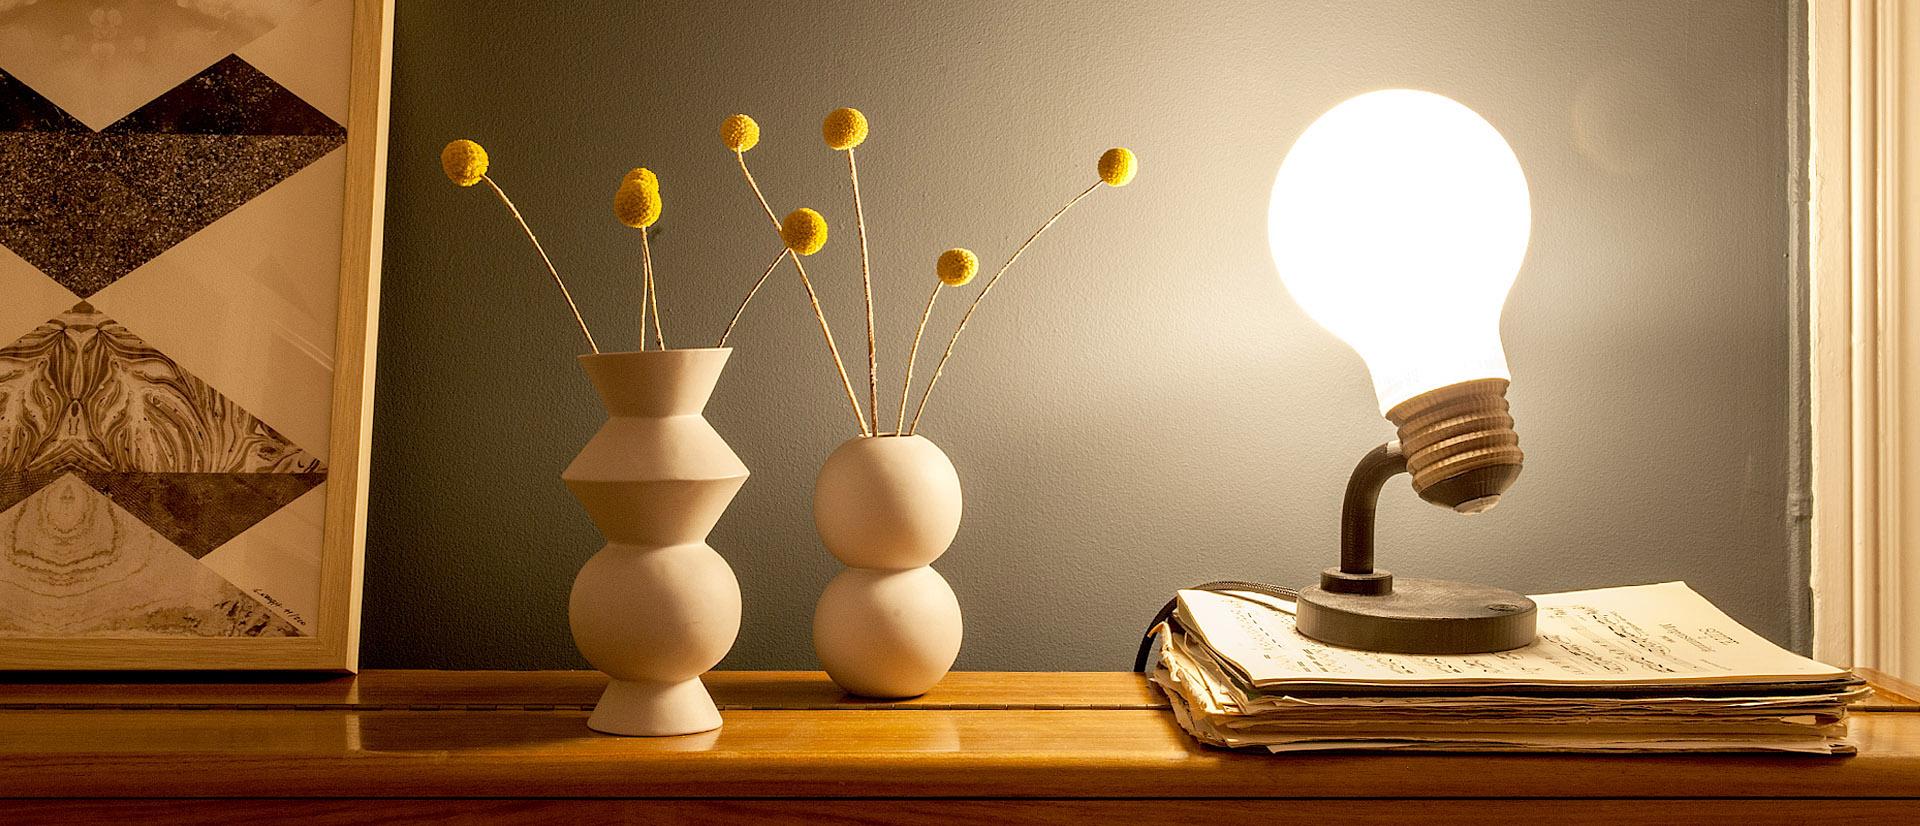 Justpressprint 3d printed Bulb Light on Piano